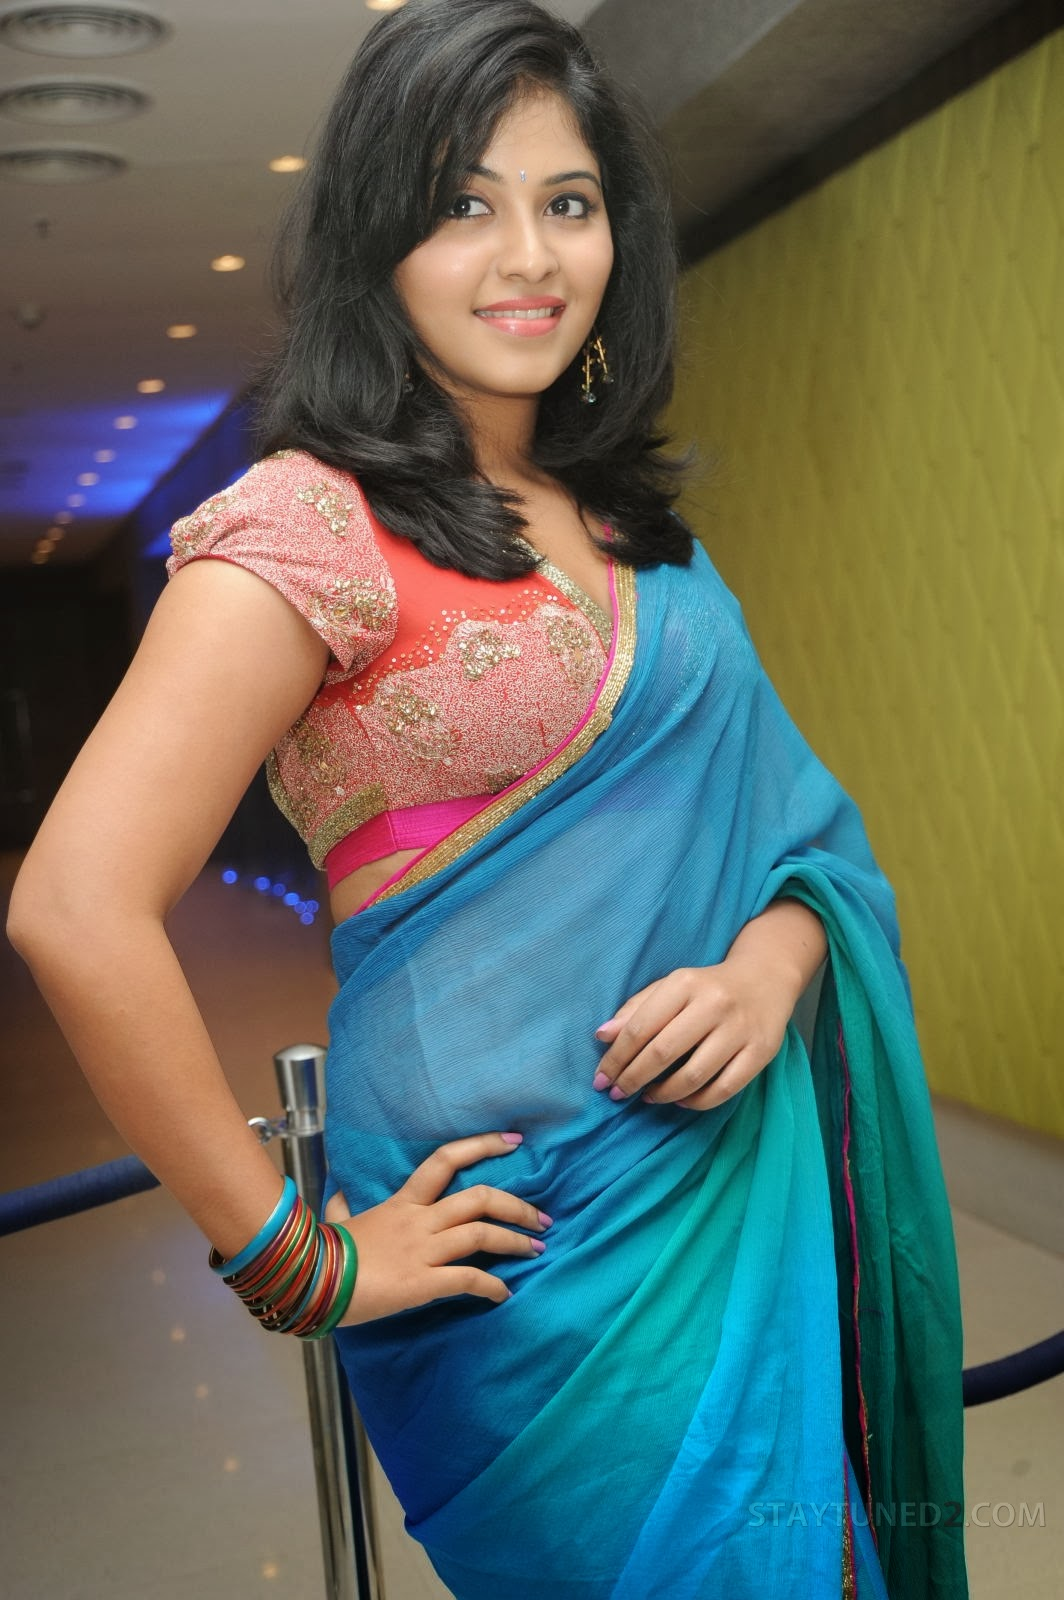 Anjali in saree at event